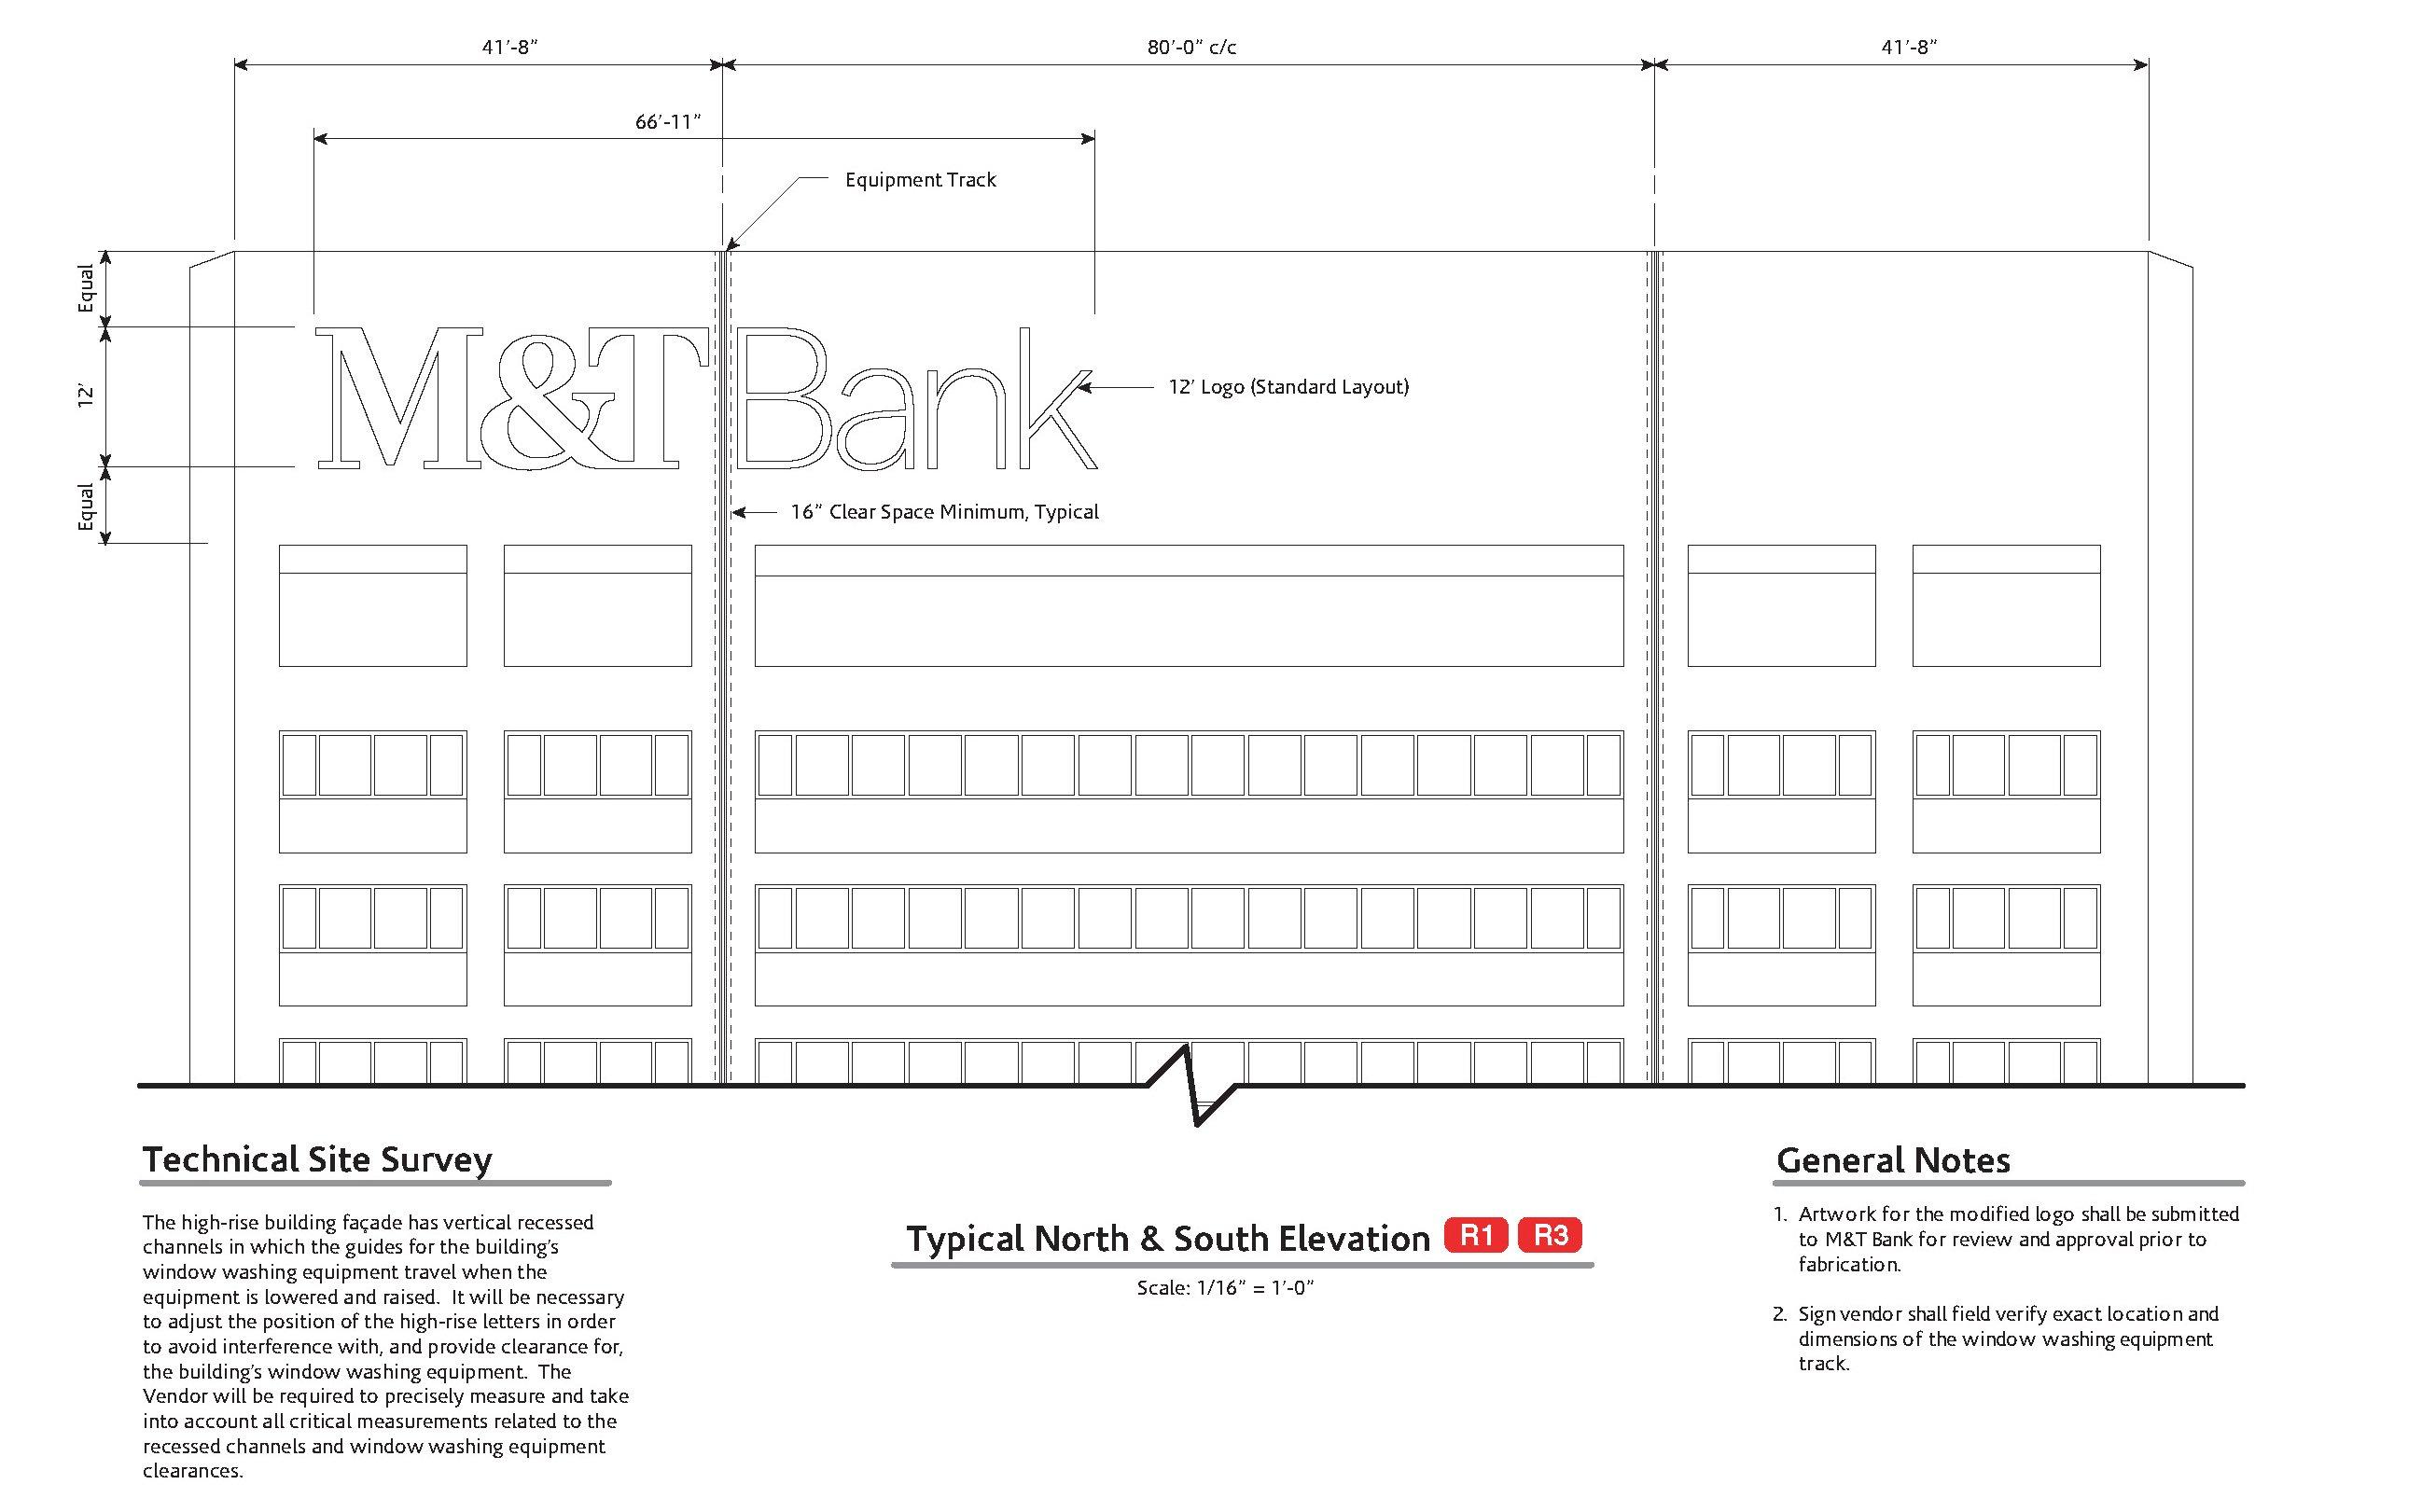 M&T Bank - Seneca One Tower - Design Drawing - 5